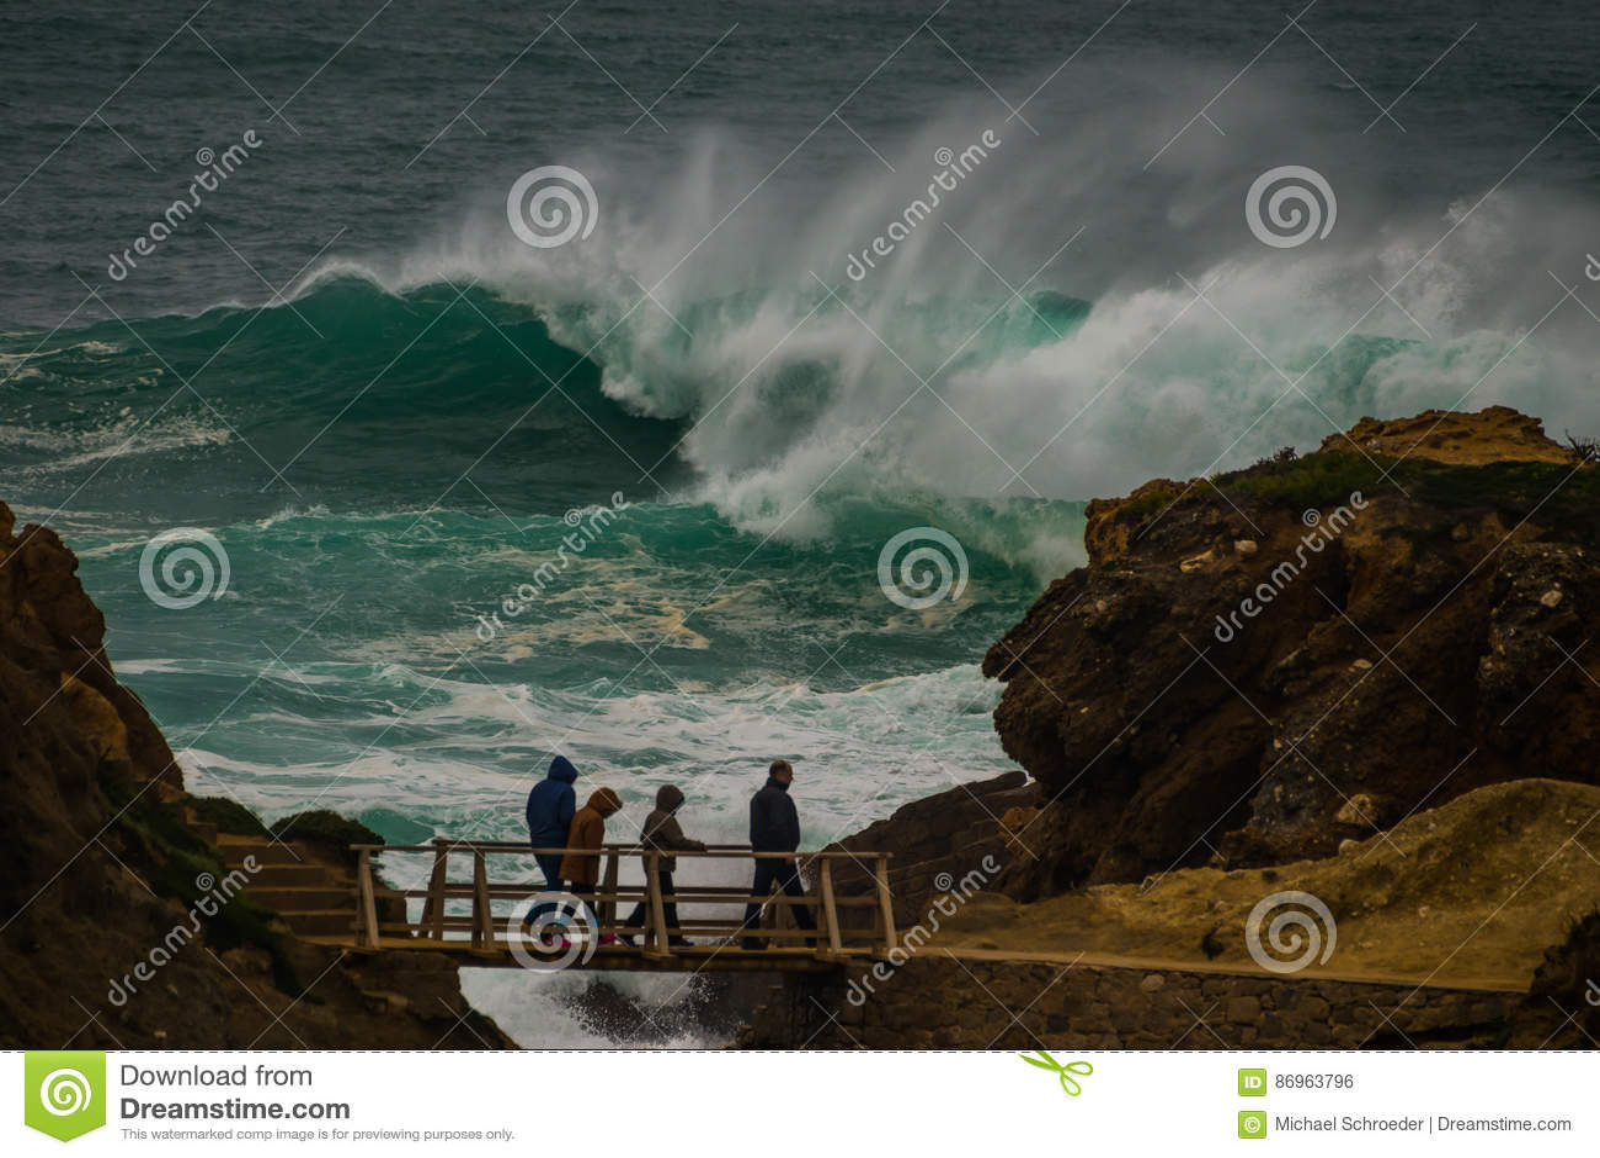 Freak wave at the coastline in Portugal